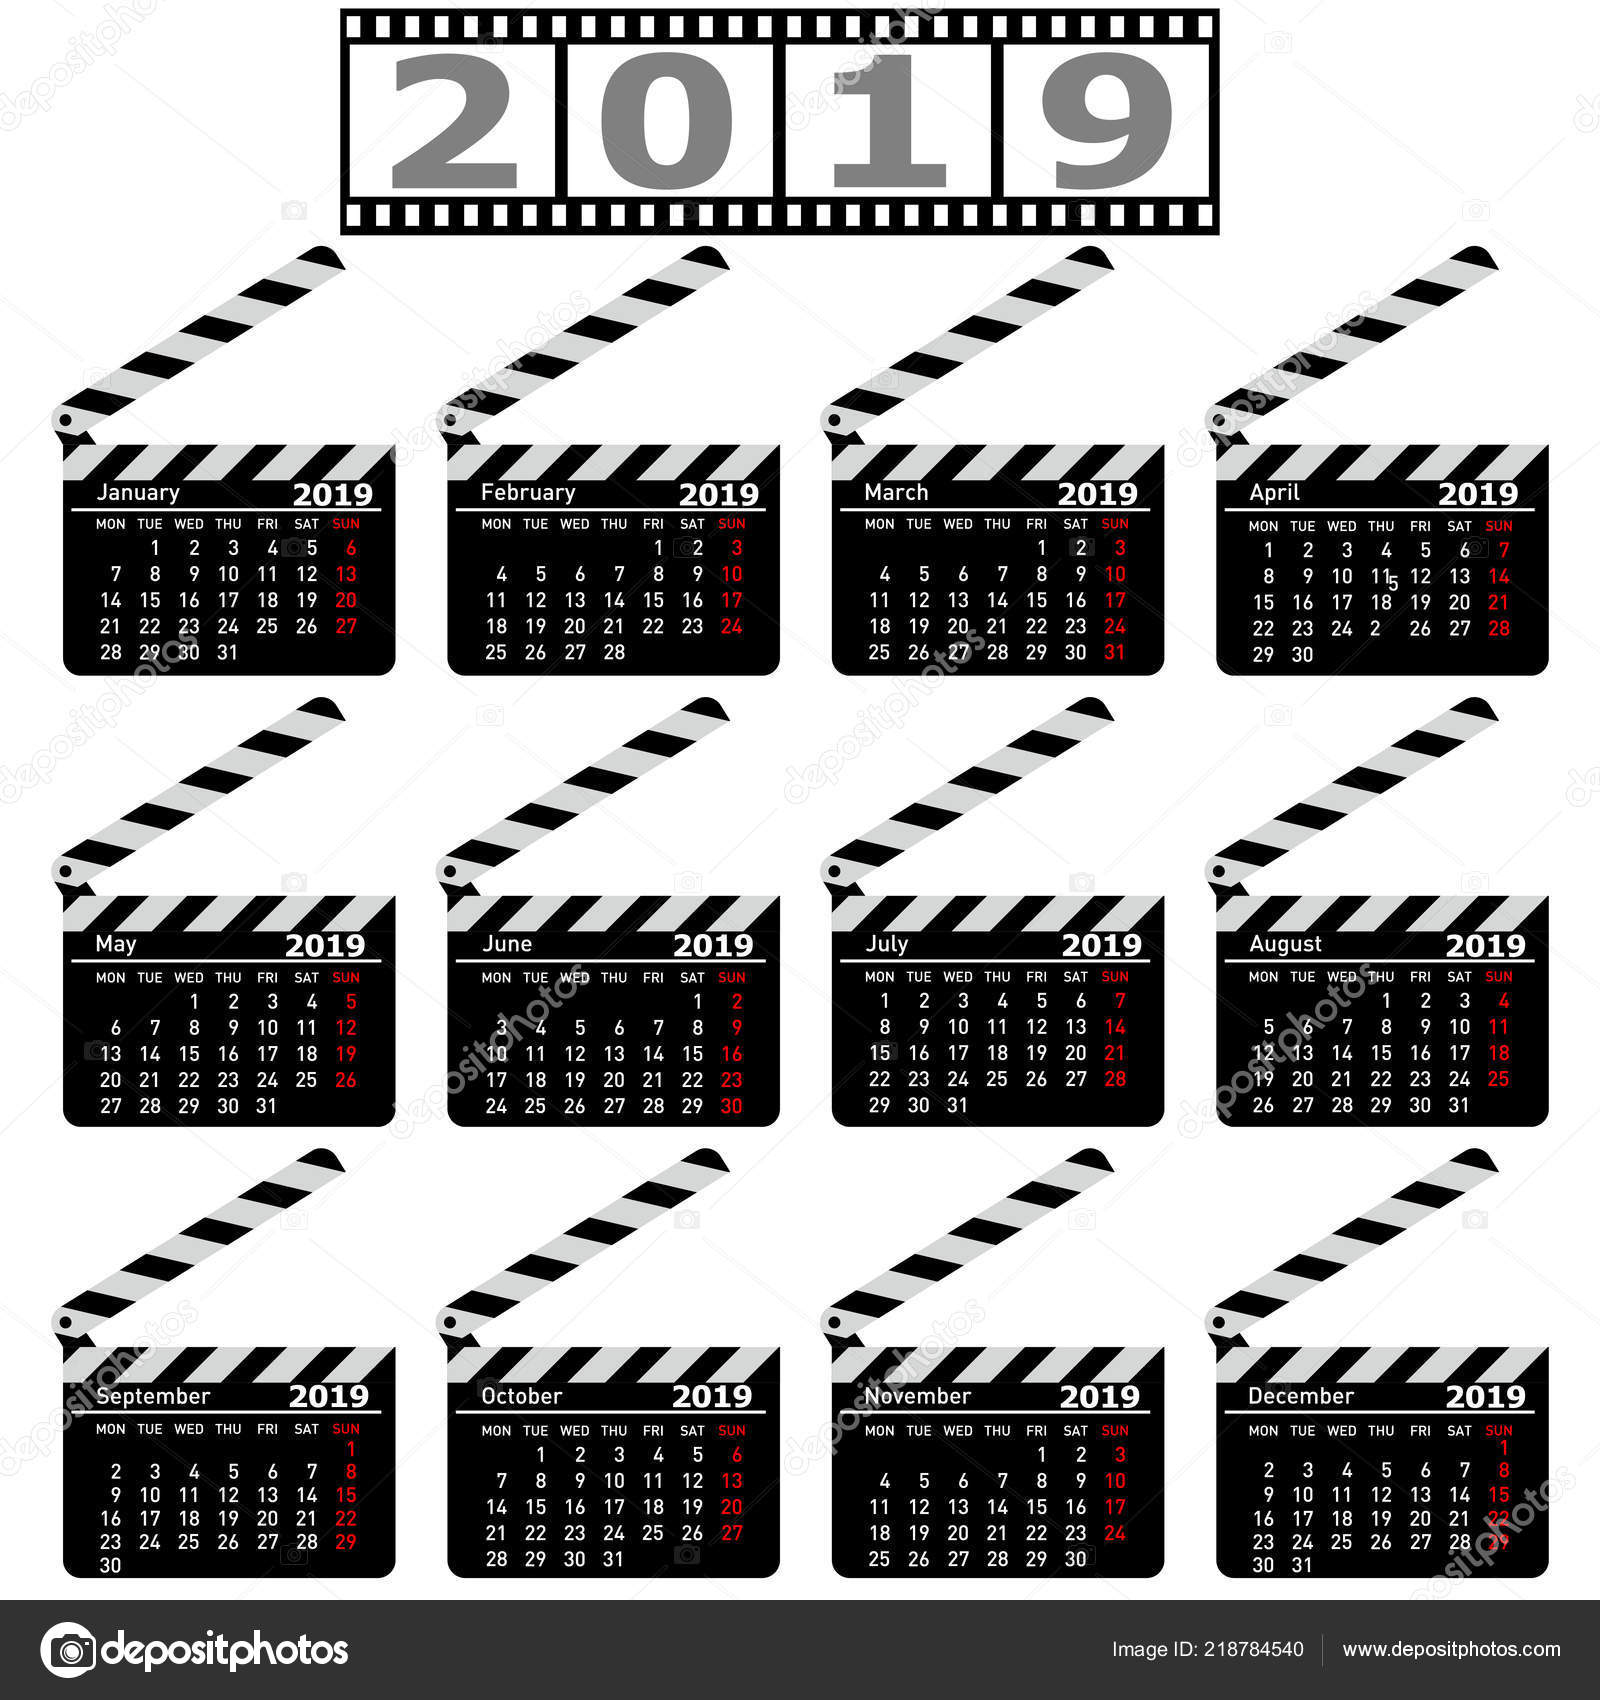 2019 Movie Calendar Calendar for 2019, movie clapper board on a white background